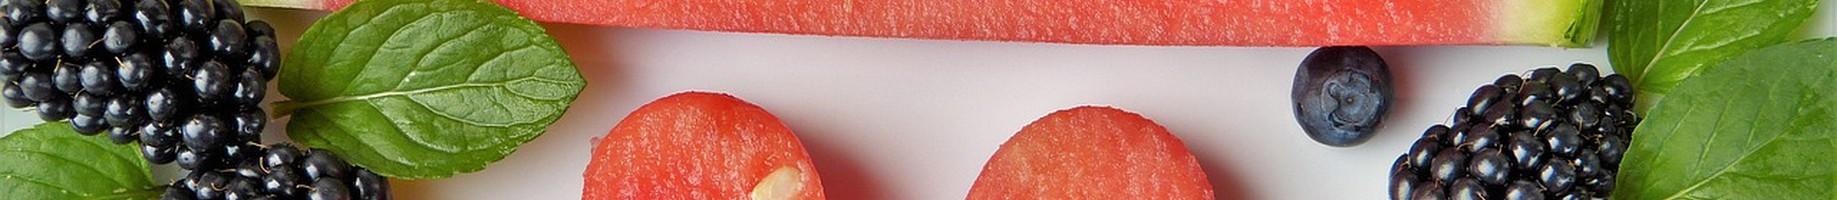 fruit-2367029_1280